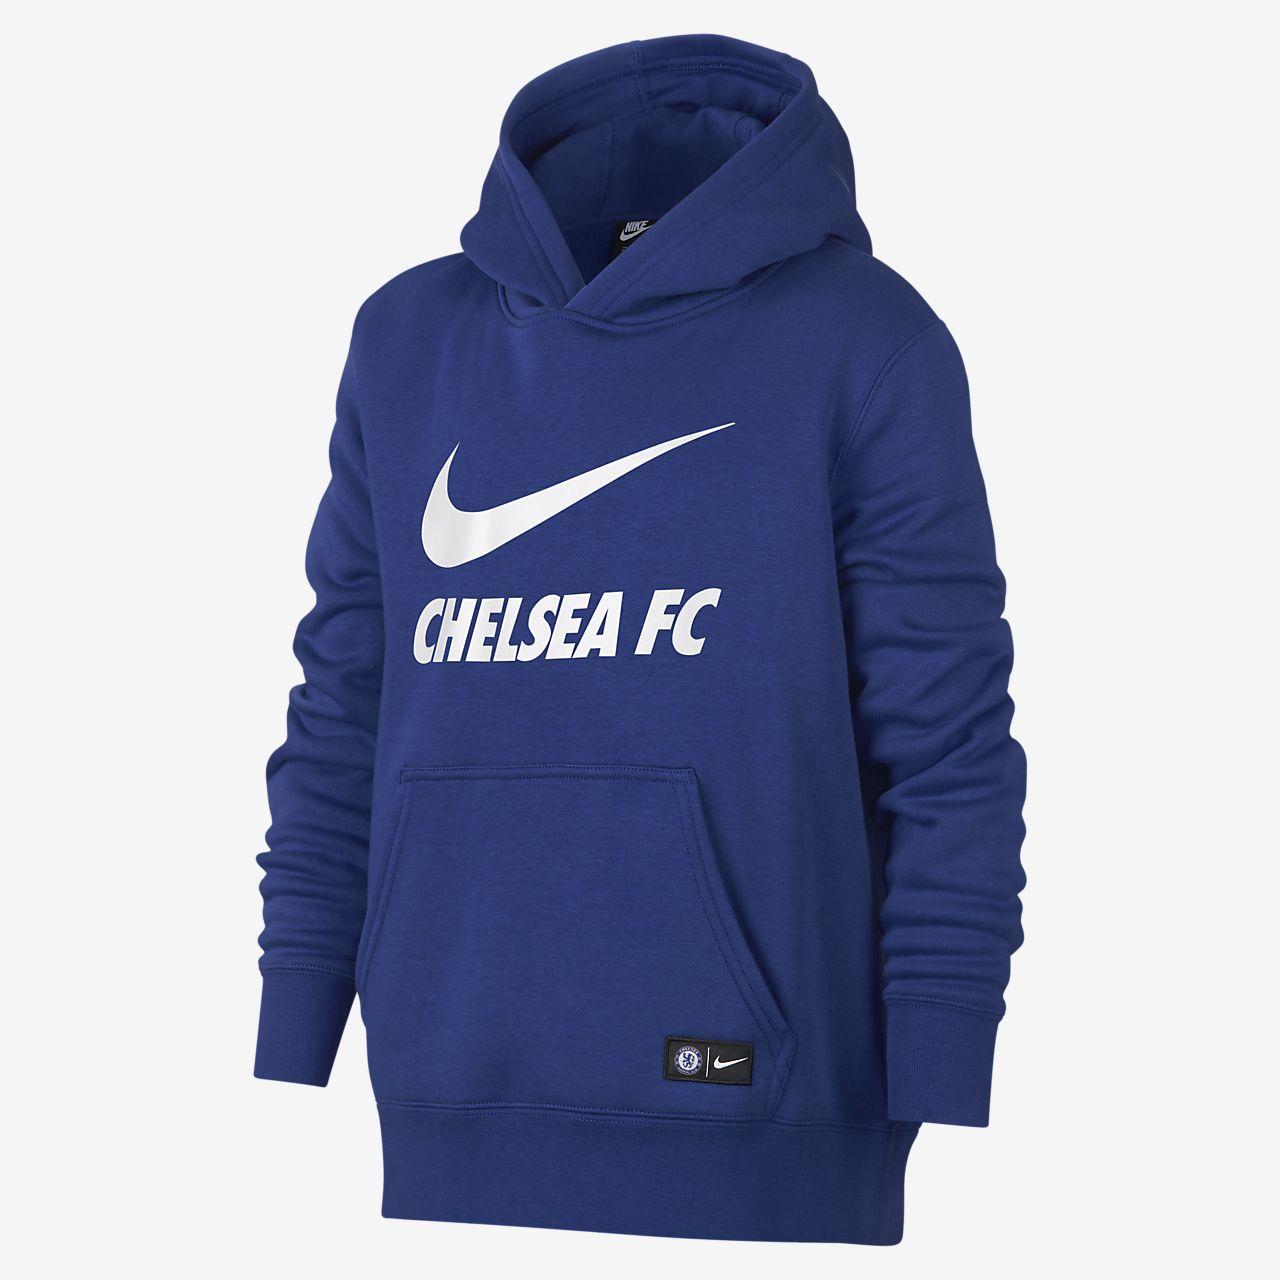 6909a49b30a3 Chelsea FC Older Kids  Sweatshirt Hoodie. Nike.com BG